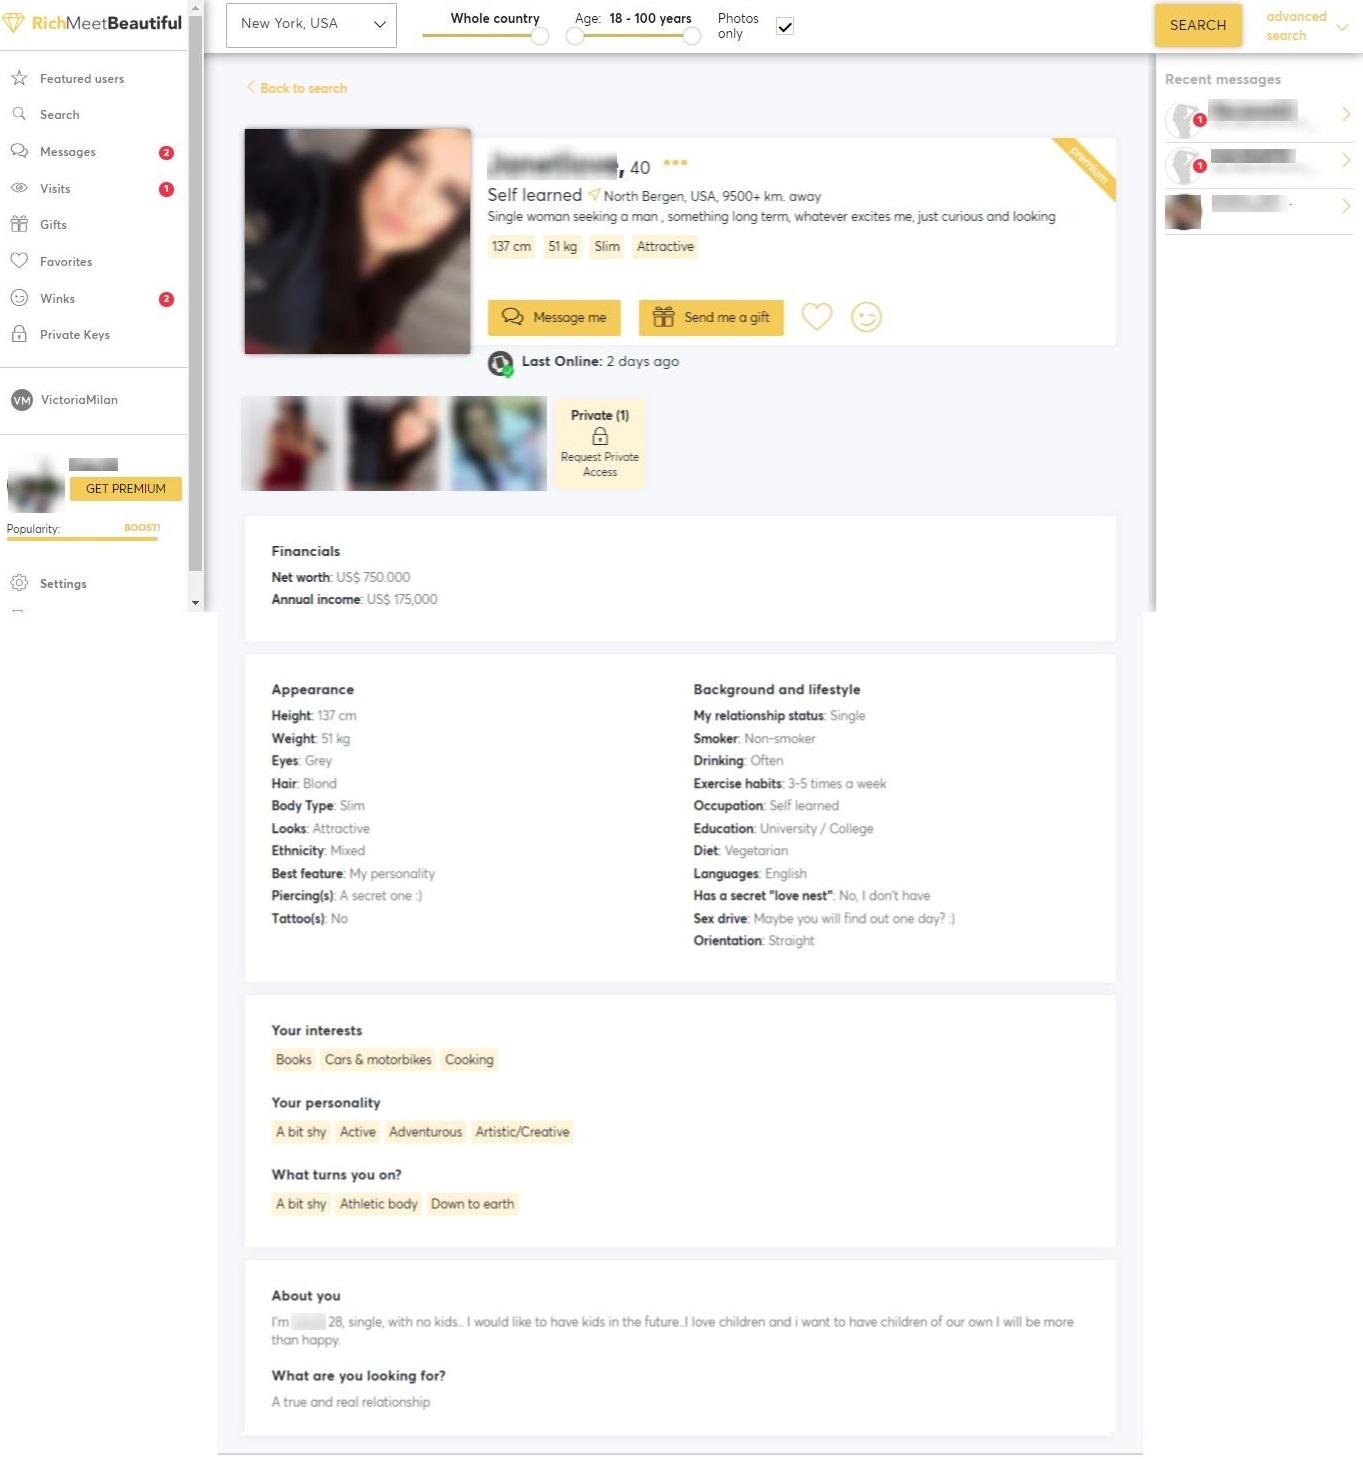 RichMeetBeautiful Female Profile